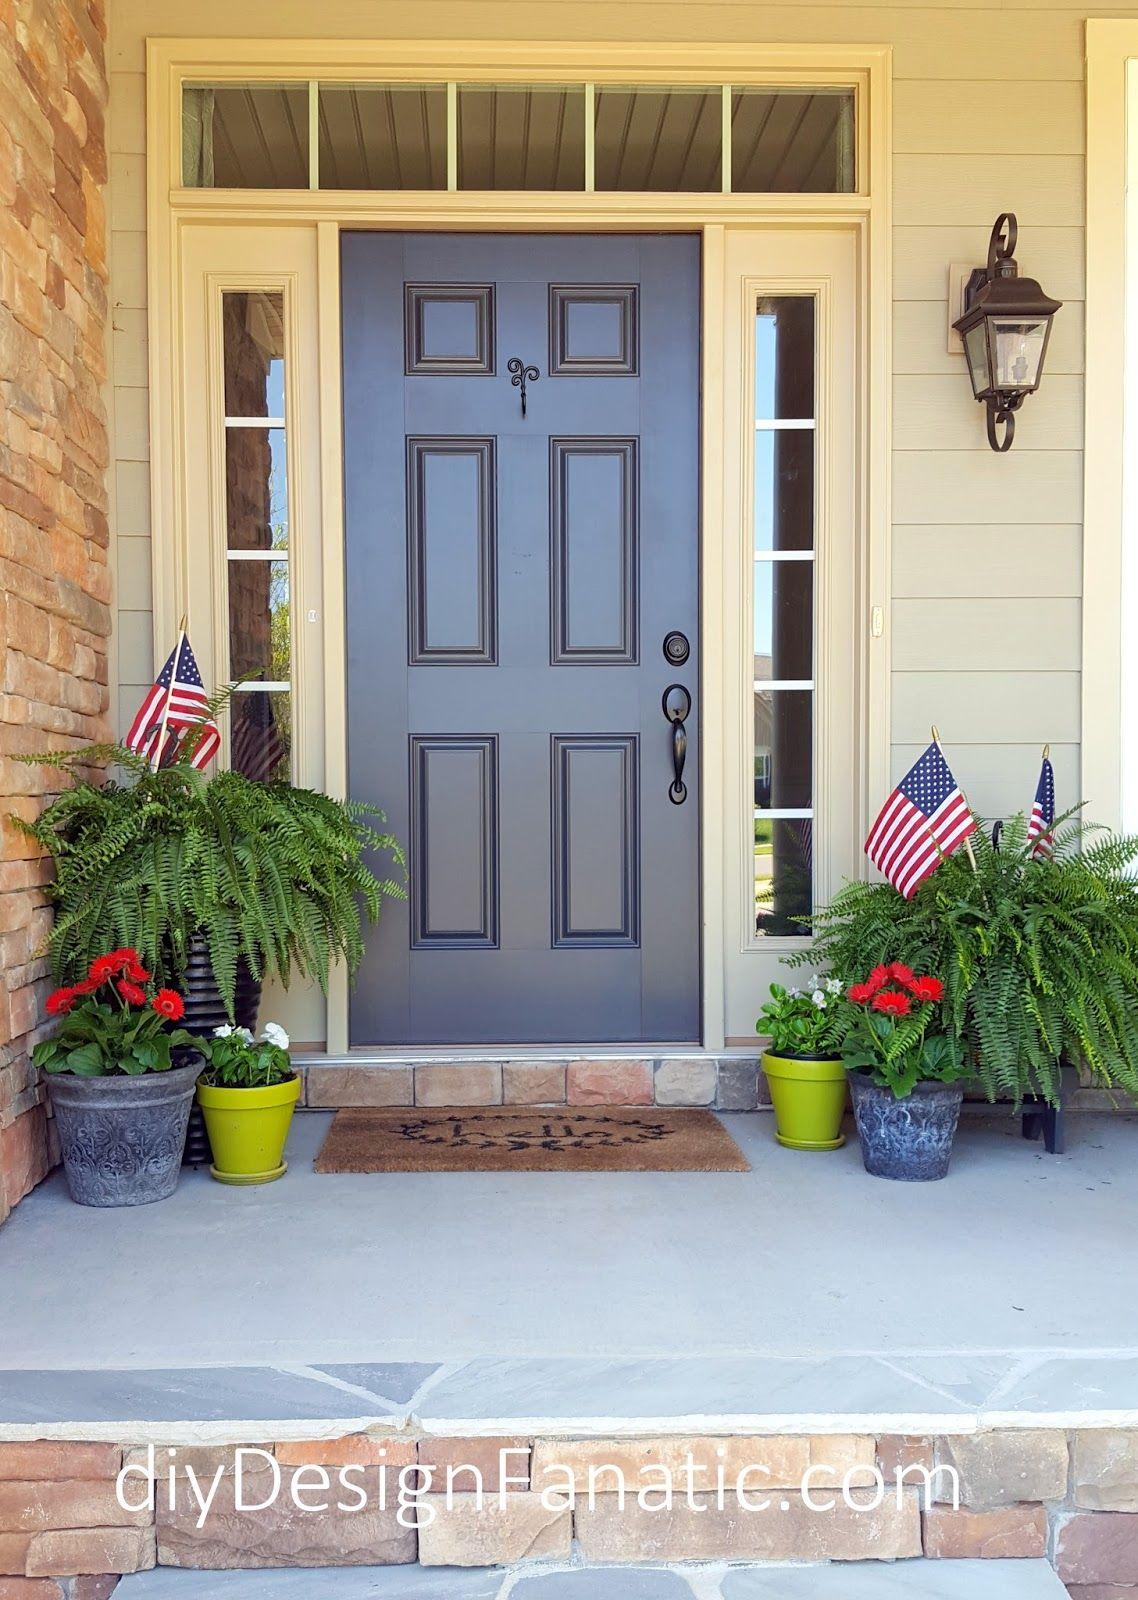 1561975322 424 10 last minute 4th of july porch decor ideas - 10 Last Minute 4th of July Porch Decor Ideas